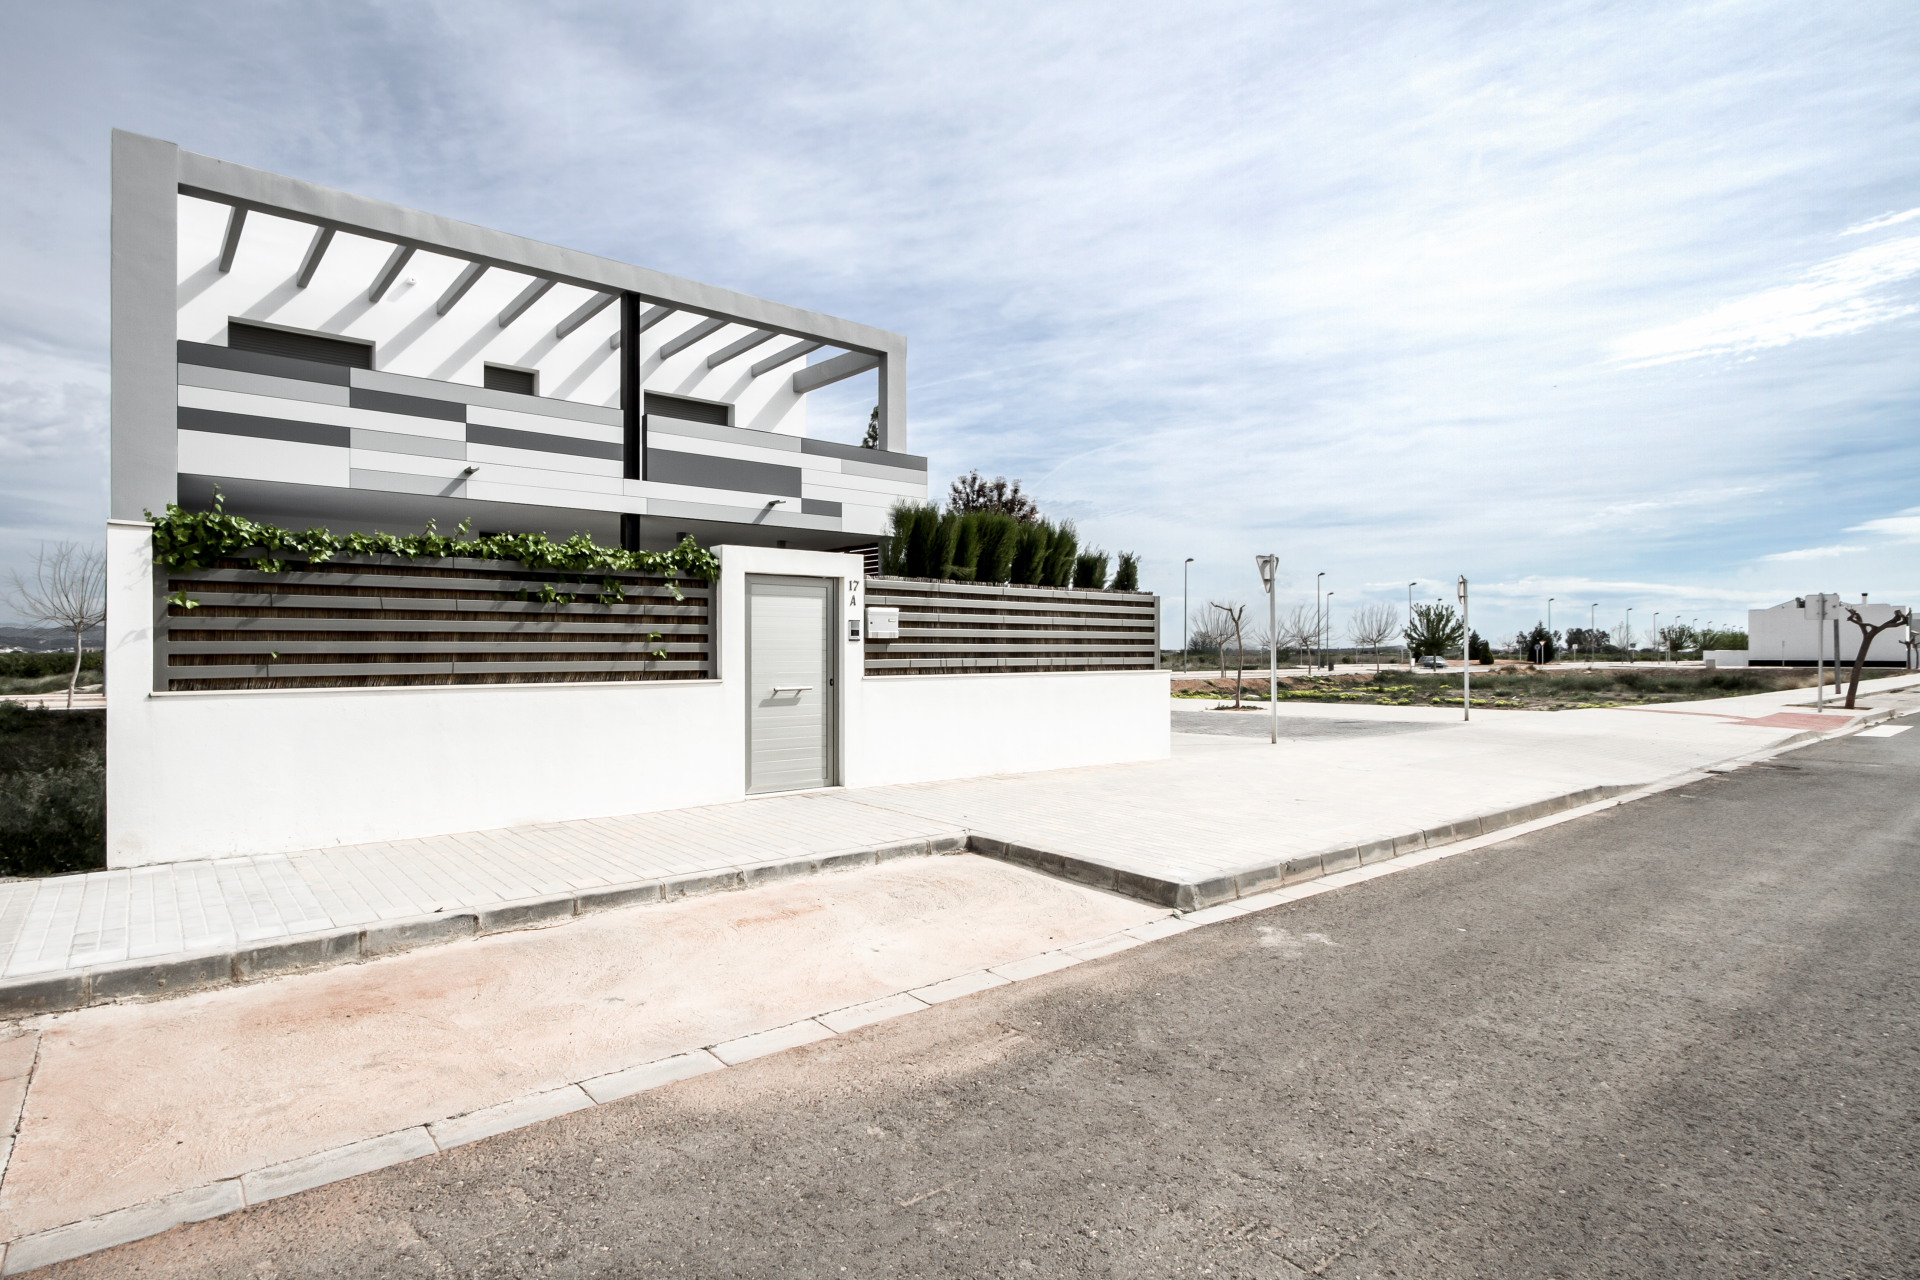 fotografia-arquitectura-valencia-german-cabo-viraje-v02 (1)